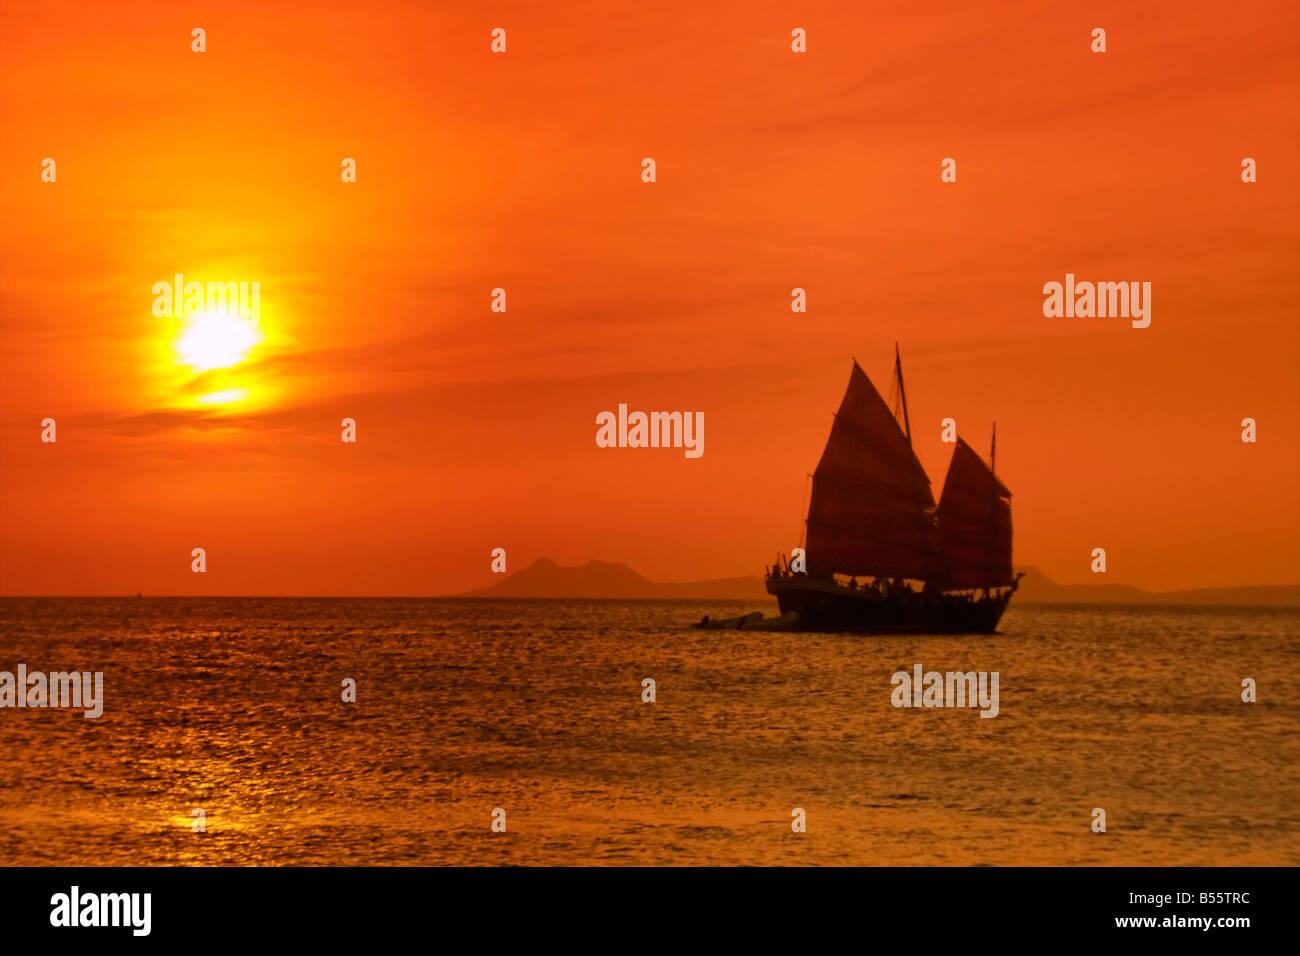 Antillen Bonaire Sonnenuntergang Segelboot Sonnenuntergang Stockbild